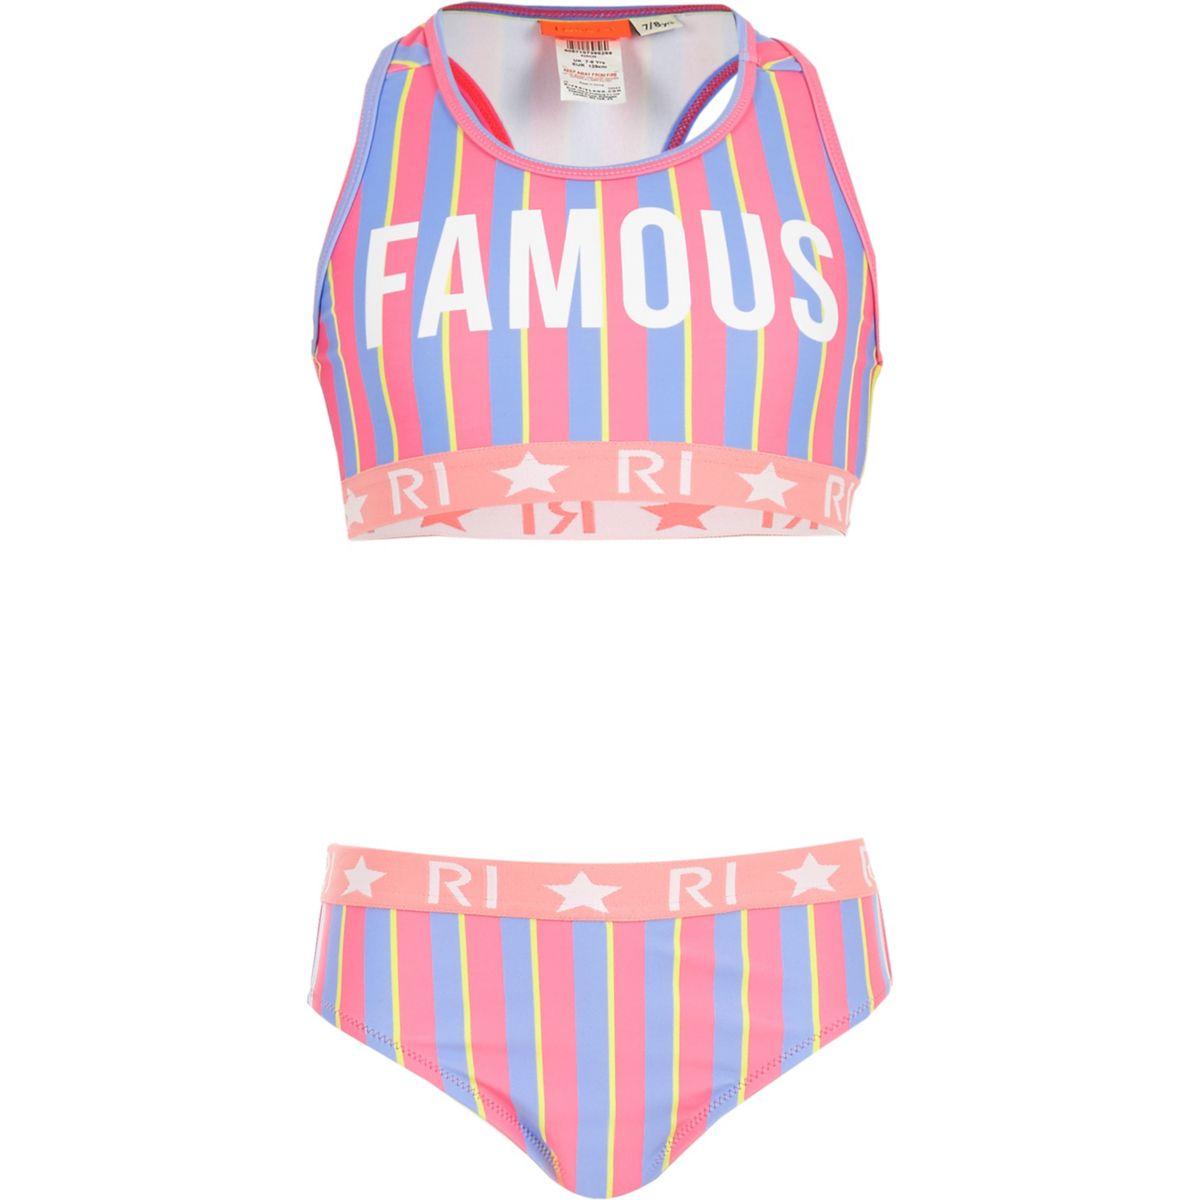 Ensemble bikini « Famous » rose pour fille